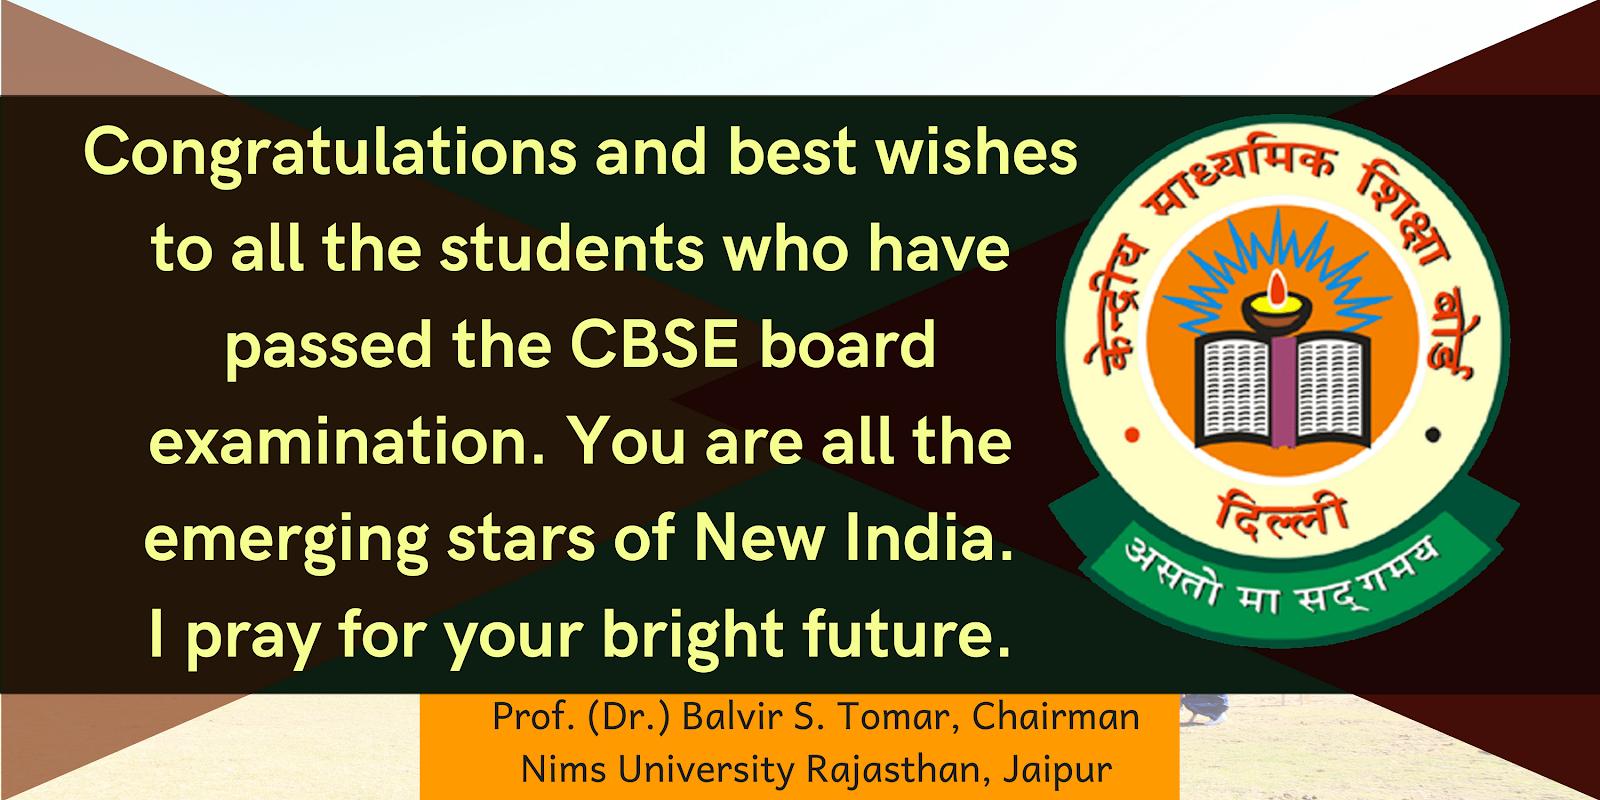 Cbse 12th Result 2018 Greetings Prof Dr Balvir S Tomar